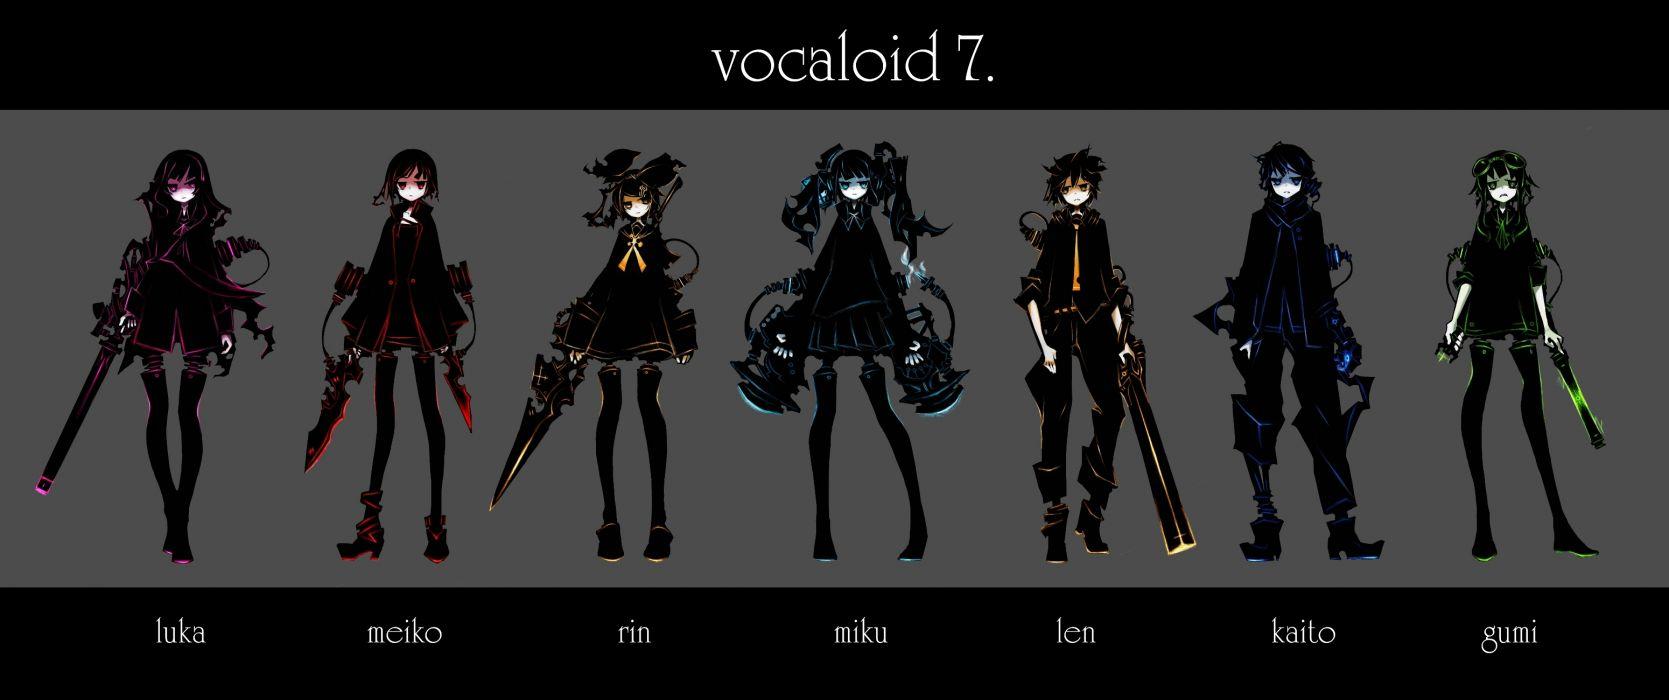 Vocaloid hatsune miku megurine luka groups kaito (vocaloid) kagamine rin kagamine len megpoid gumi meiko wallpaper